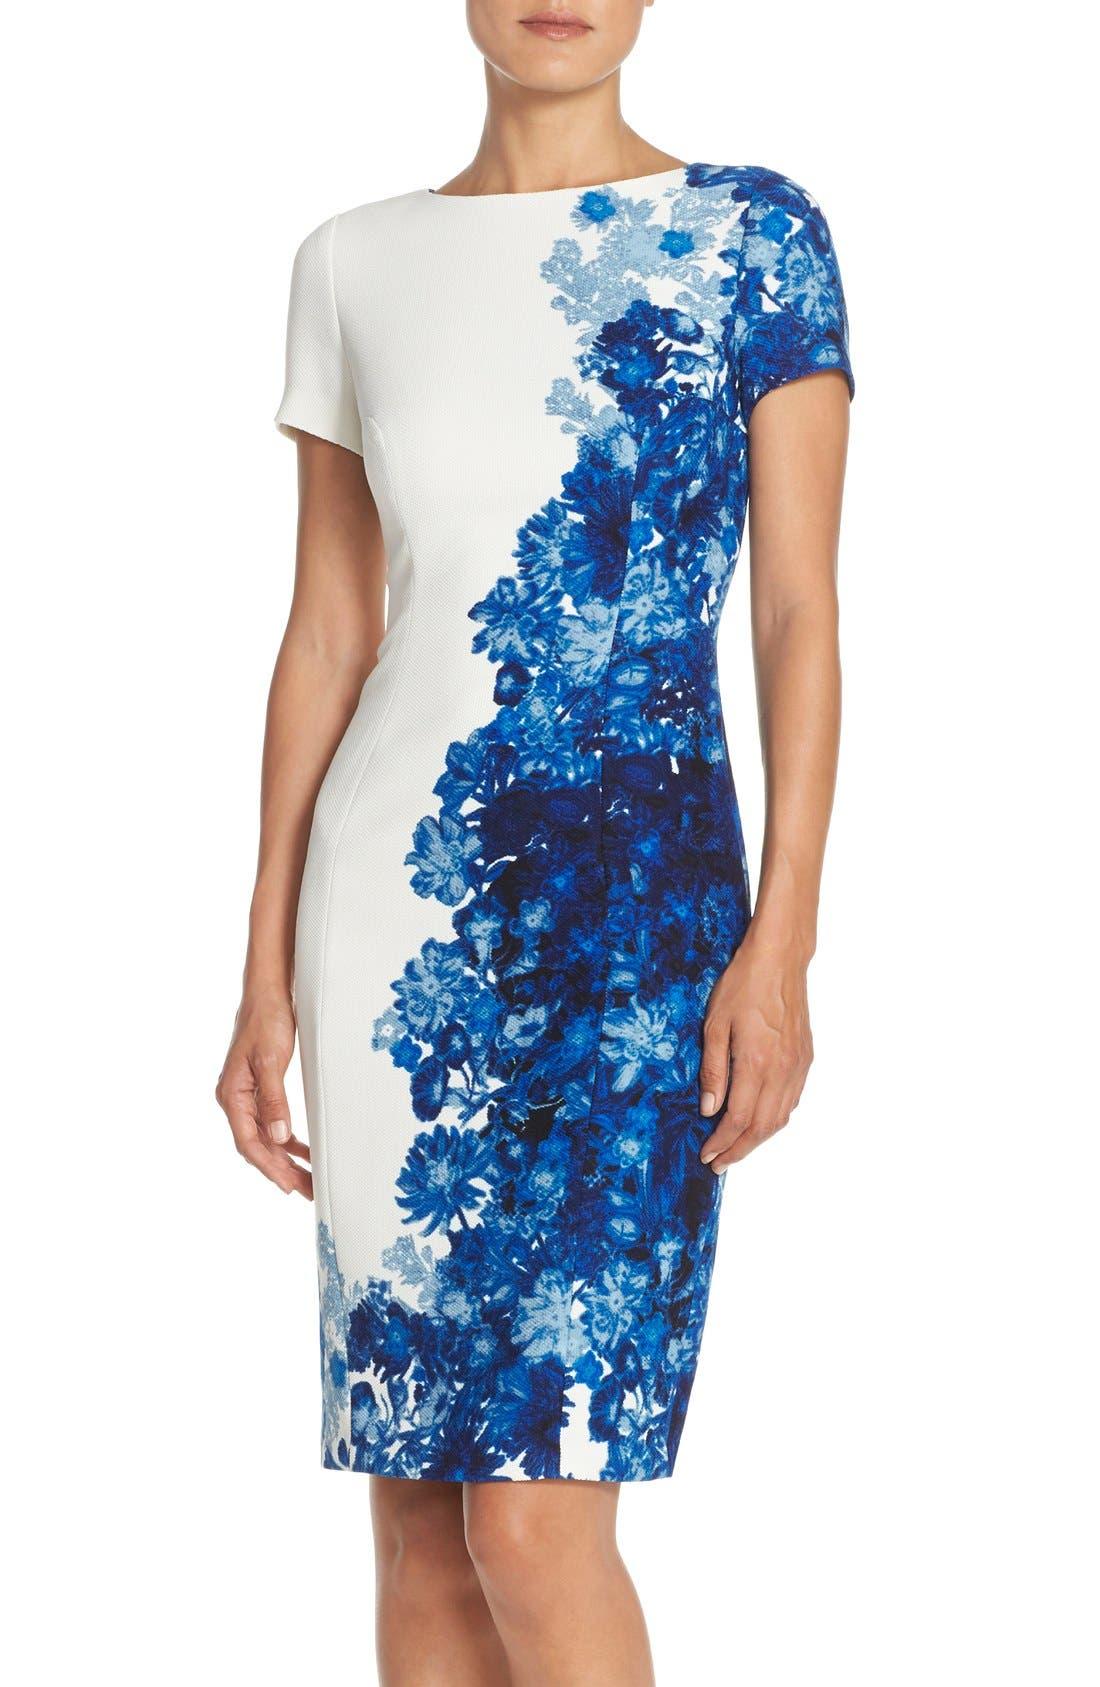 Alternate Image 1 Selected - Adrianna Papell Floral Print Waffle Piqué Sheath Dress (Regualr & Petite)